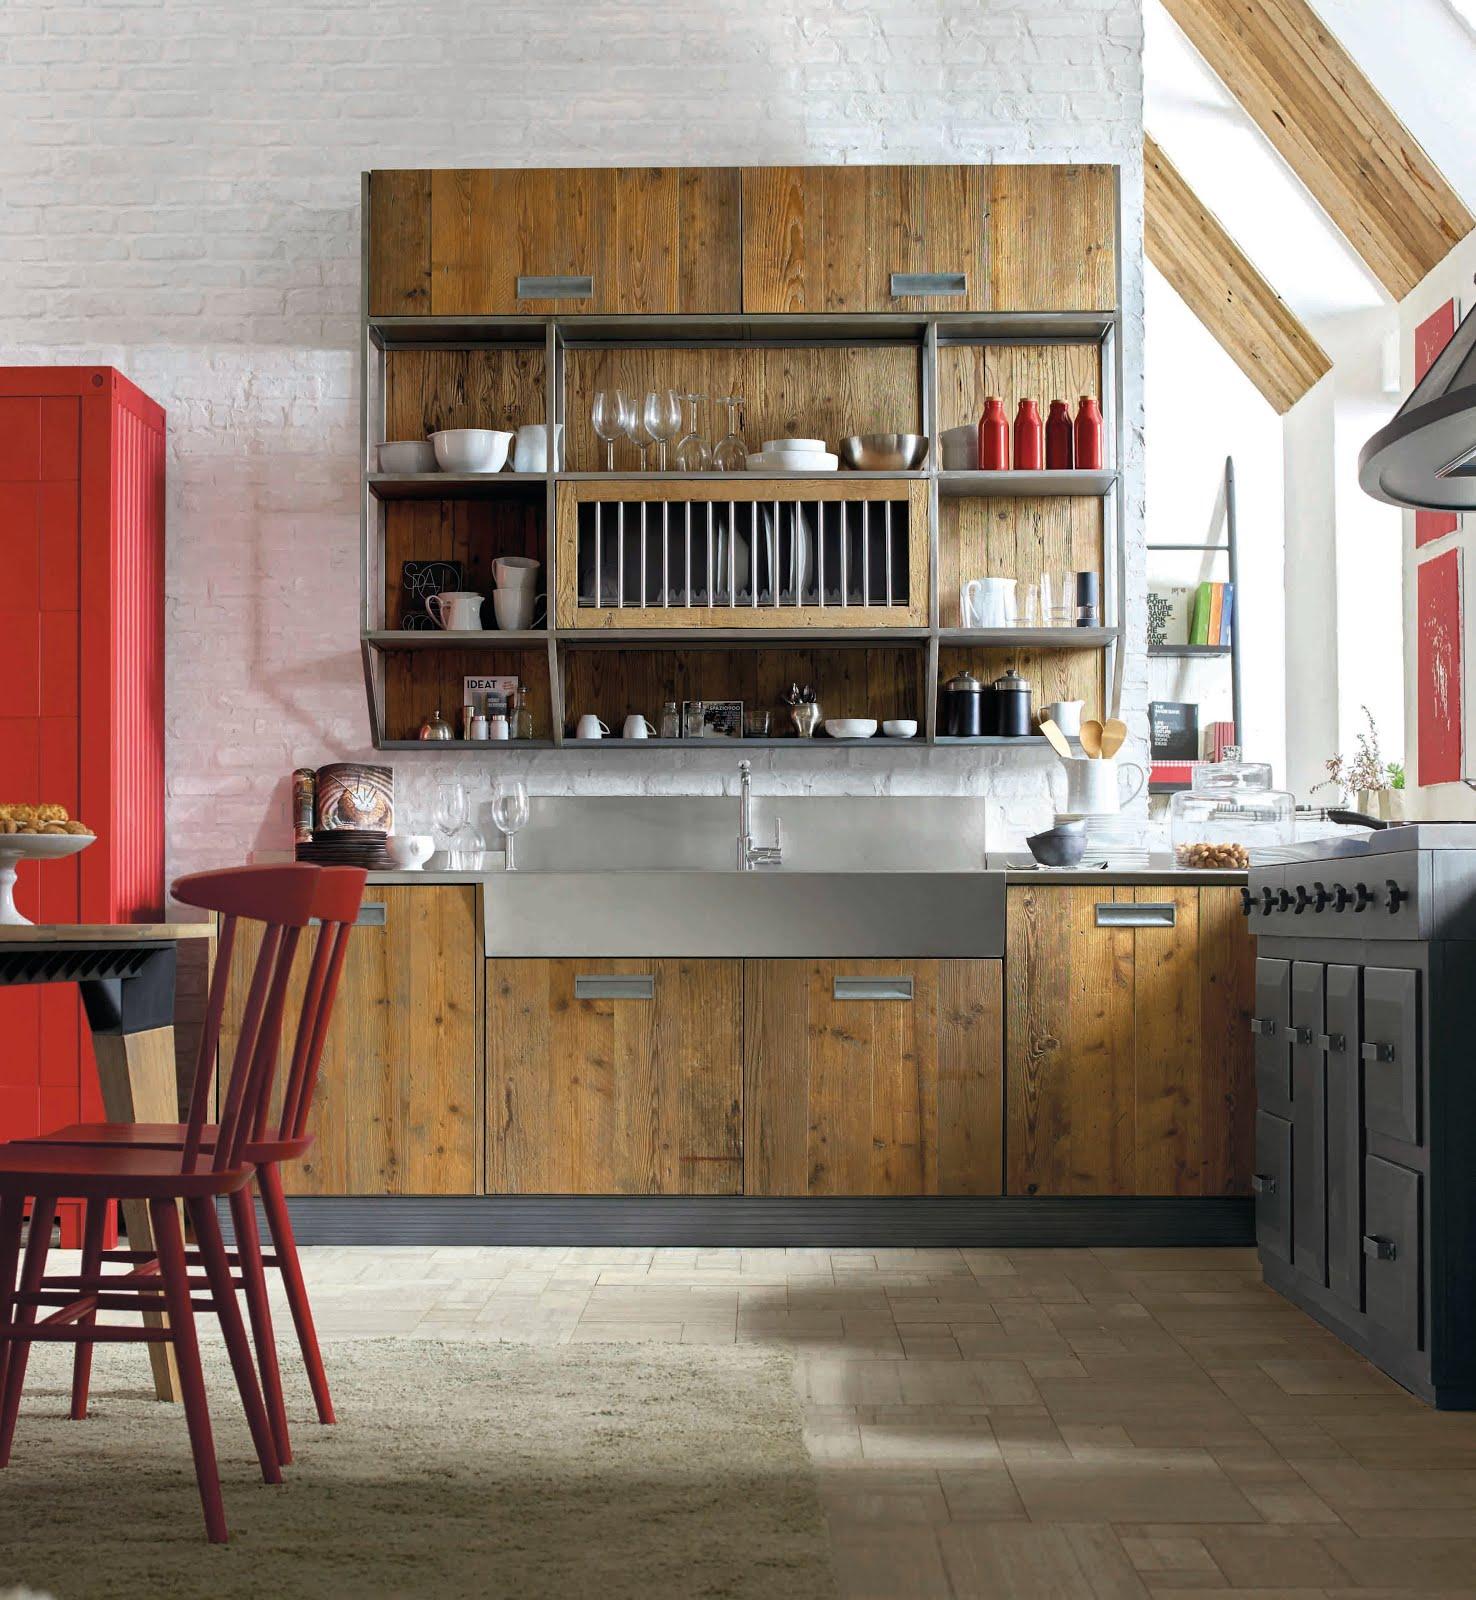 Awesome Cucine Famose Marche Contemporary - Design & Ideas 2017 ...